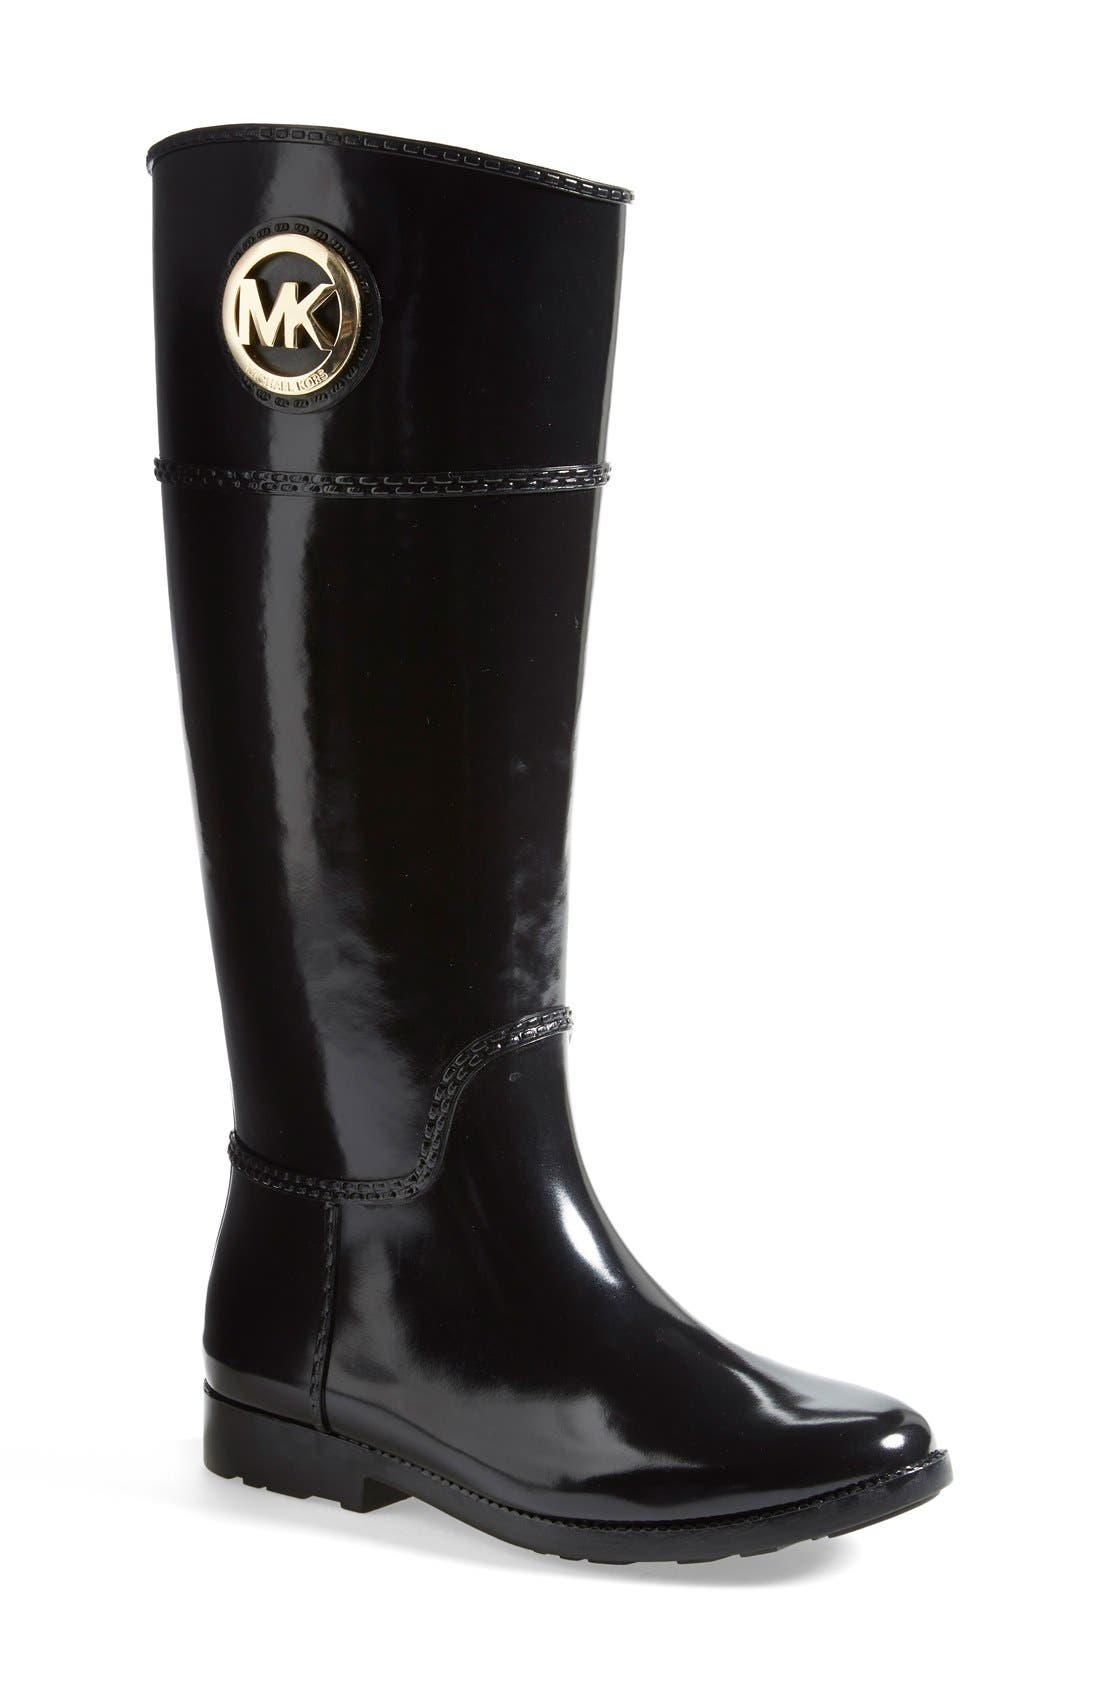 MICHAEL MICHAEL KORS 'Stockard' Rain Boot, Main, color, 001